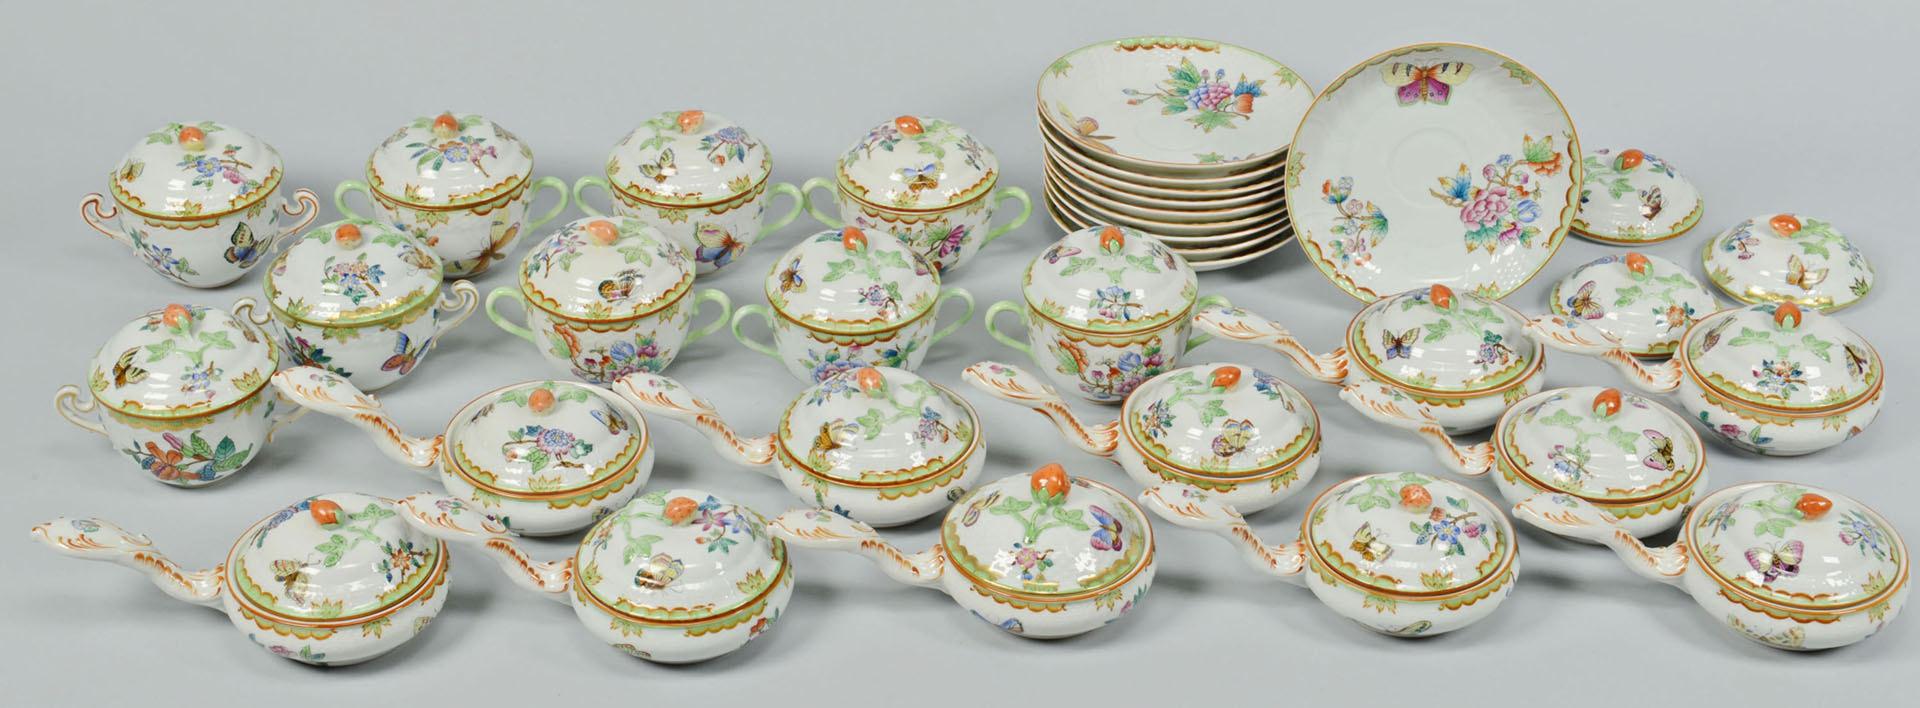 Lot 110: Rare Herend Queen Victoria Dinnerware, 33 pcs